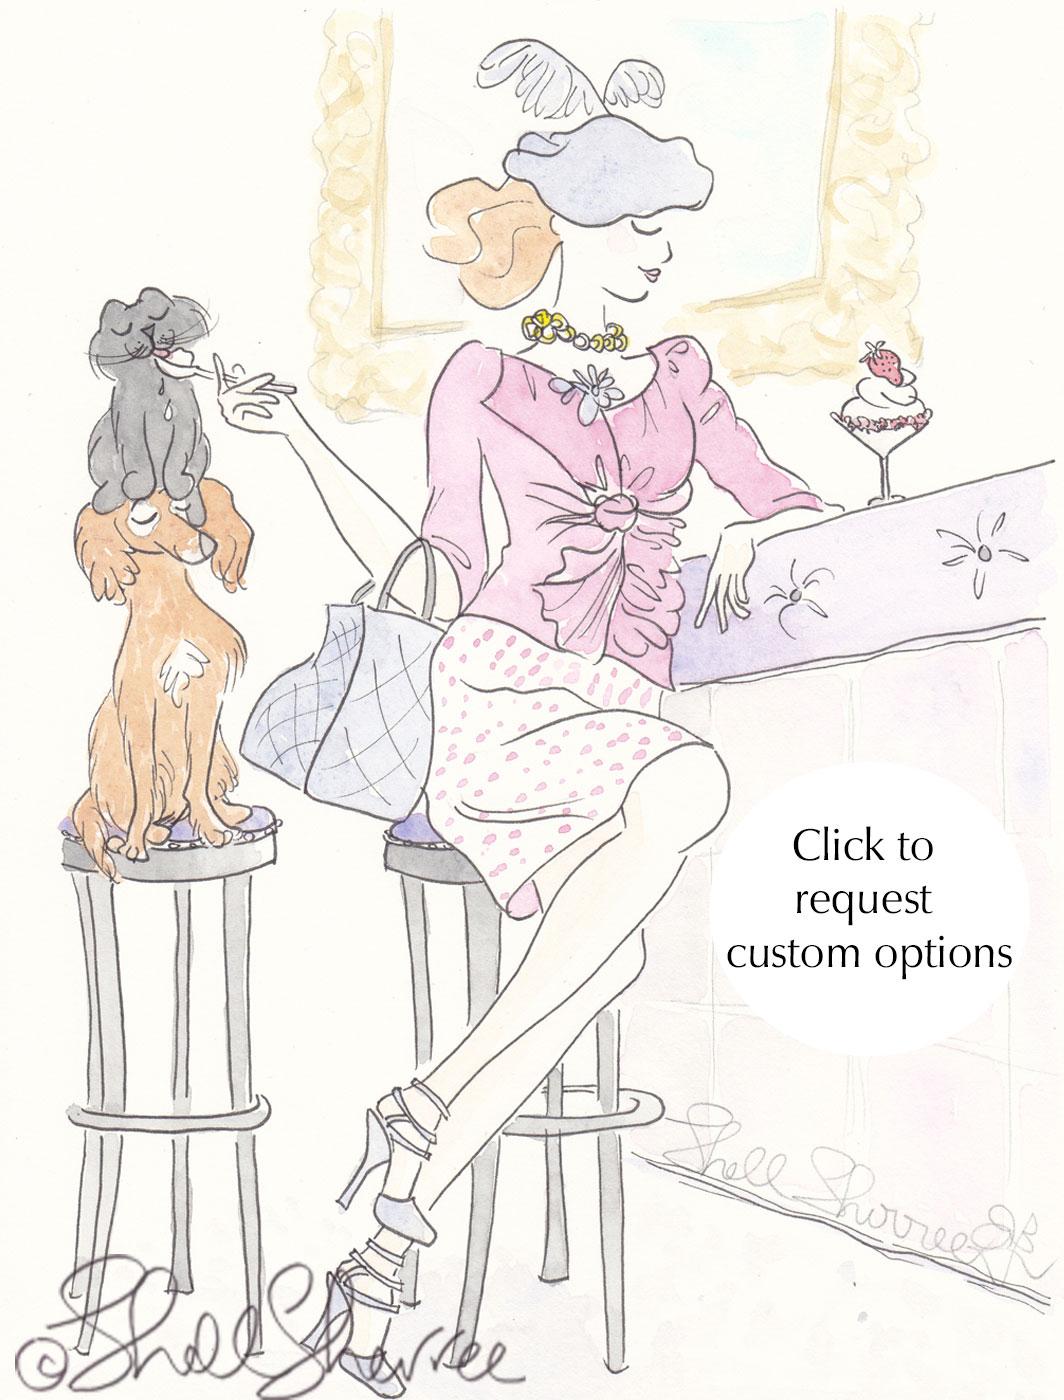 Strawberry Double Decker Sundae Fashion & Fluffballs illustration © Shell Sherree all rights reserved